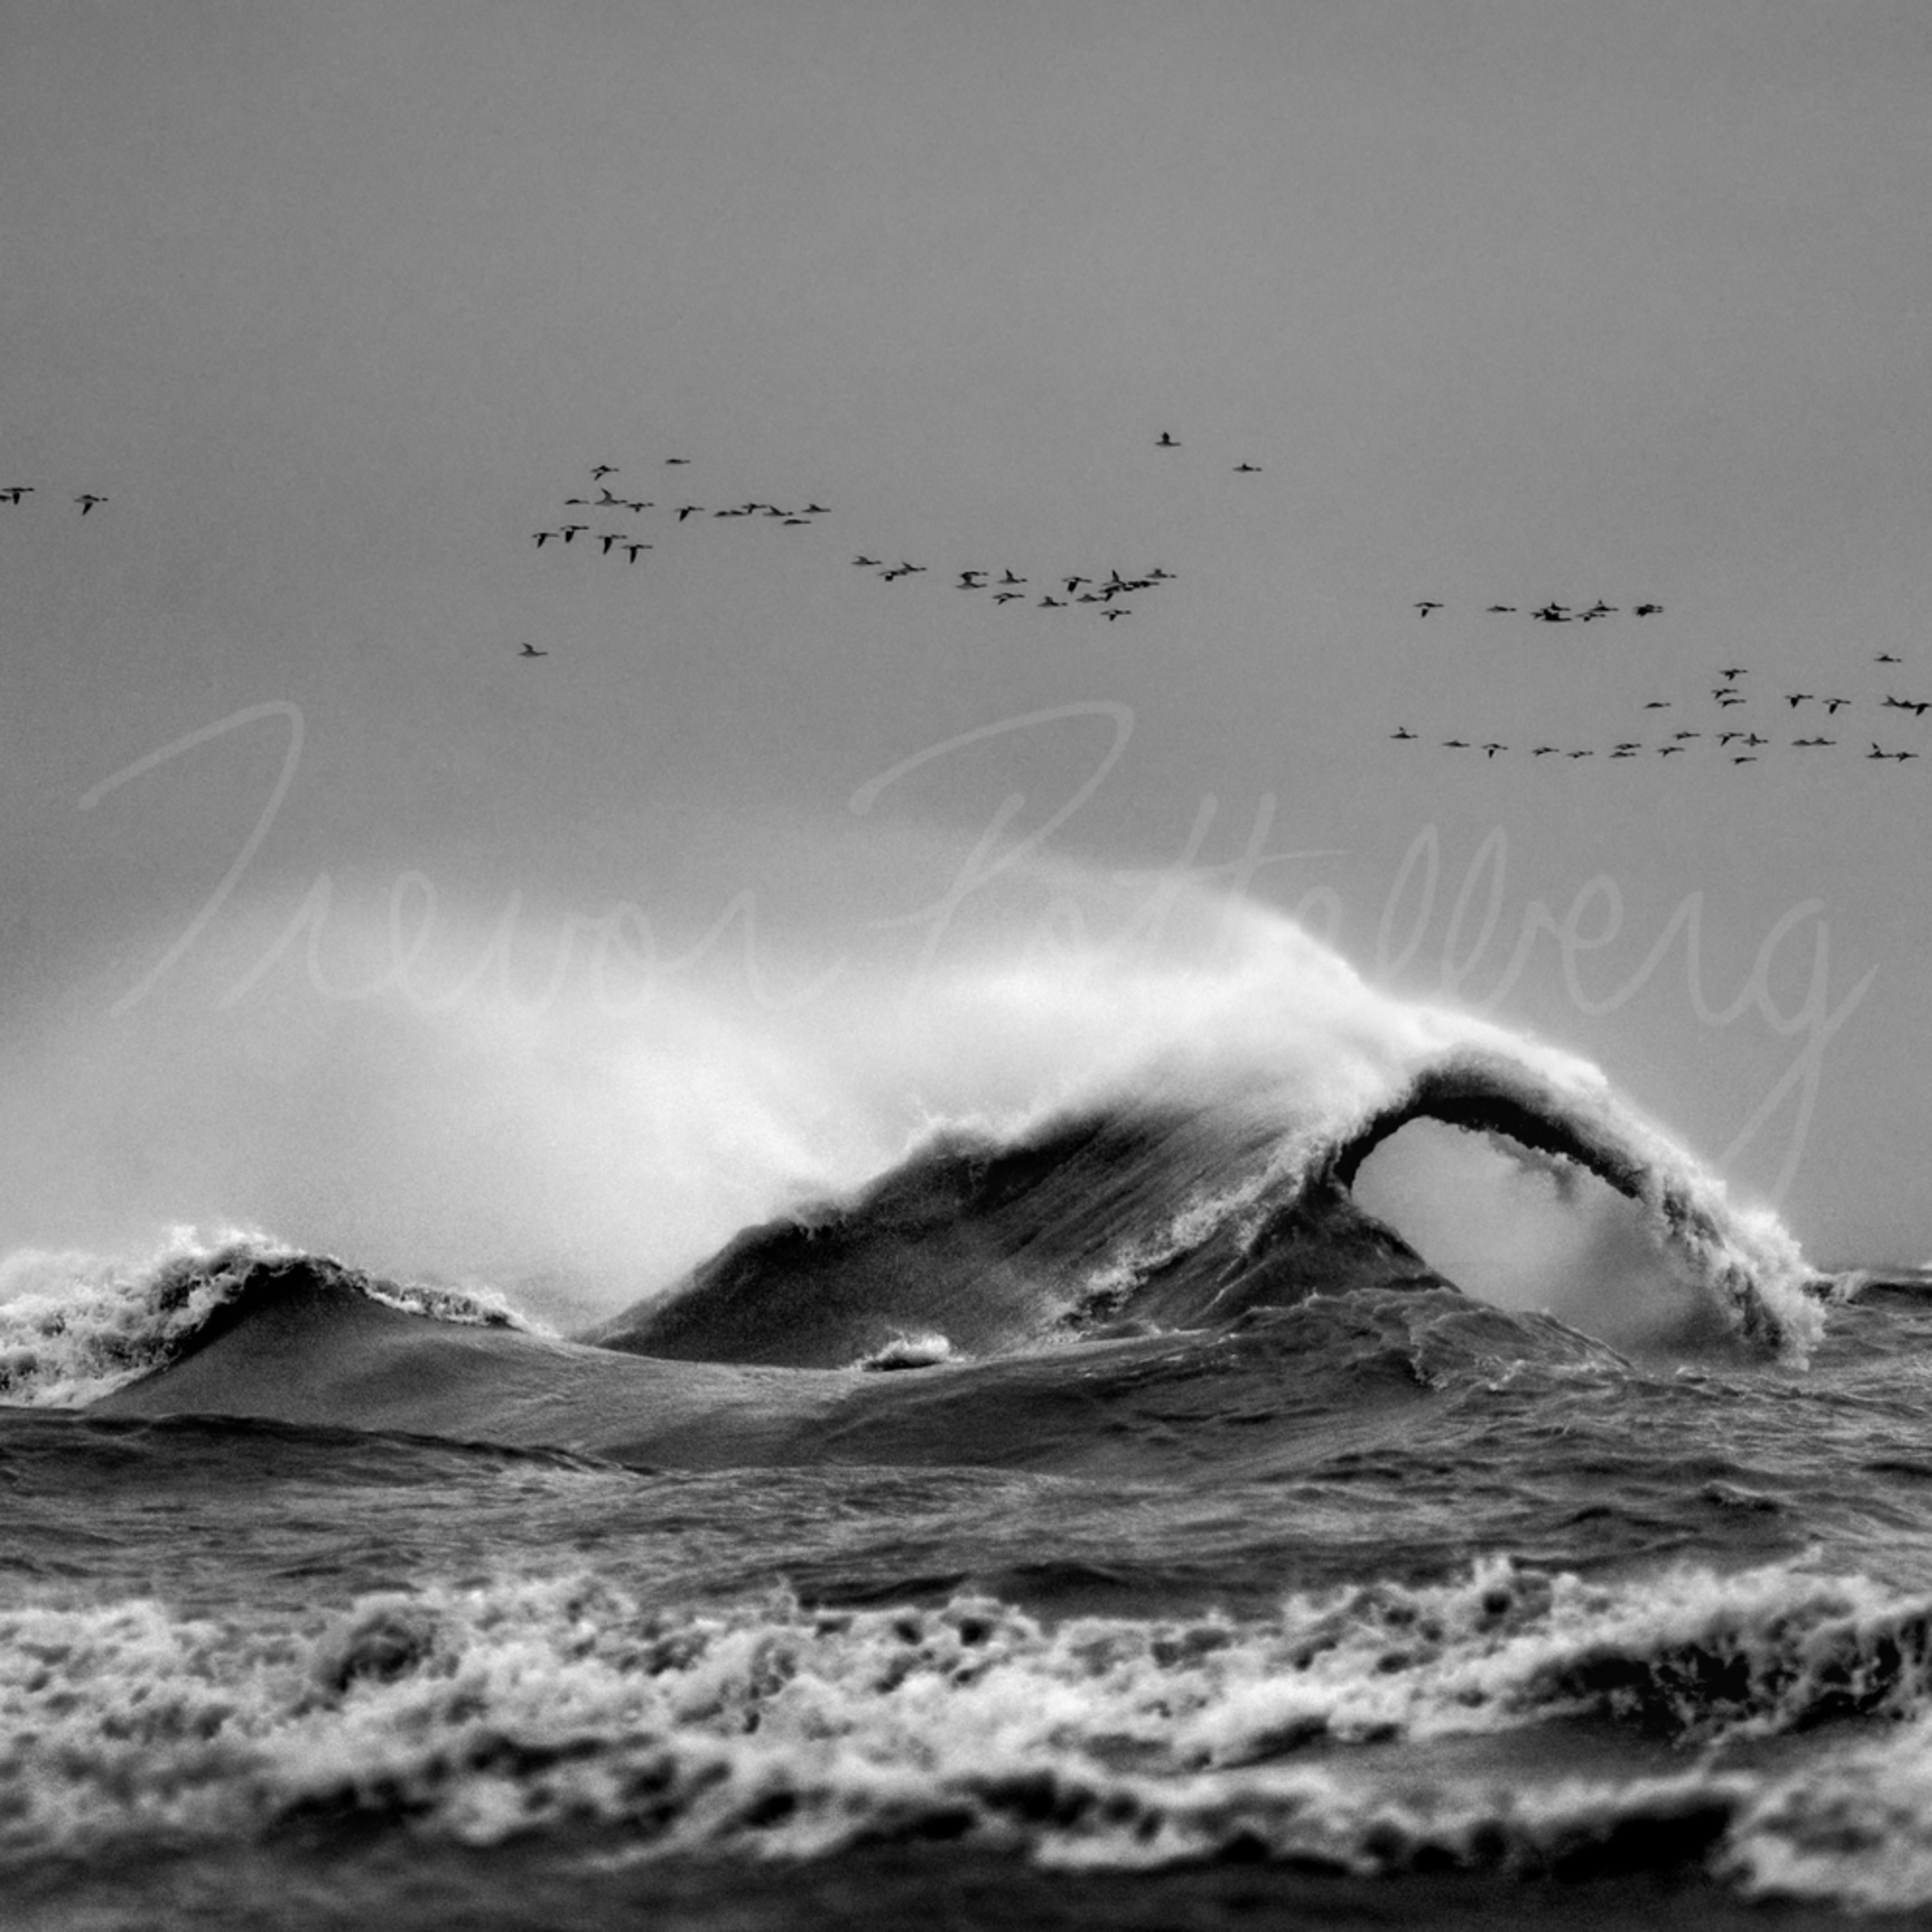 Wings over water hgbdne